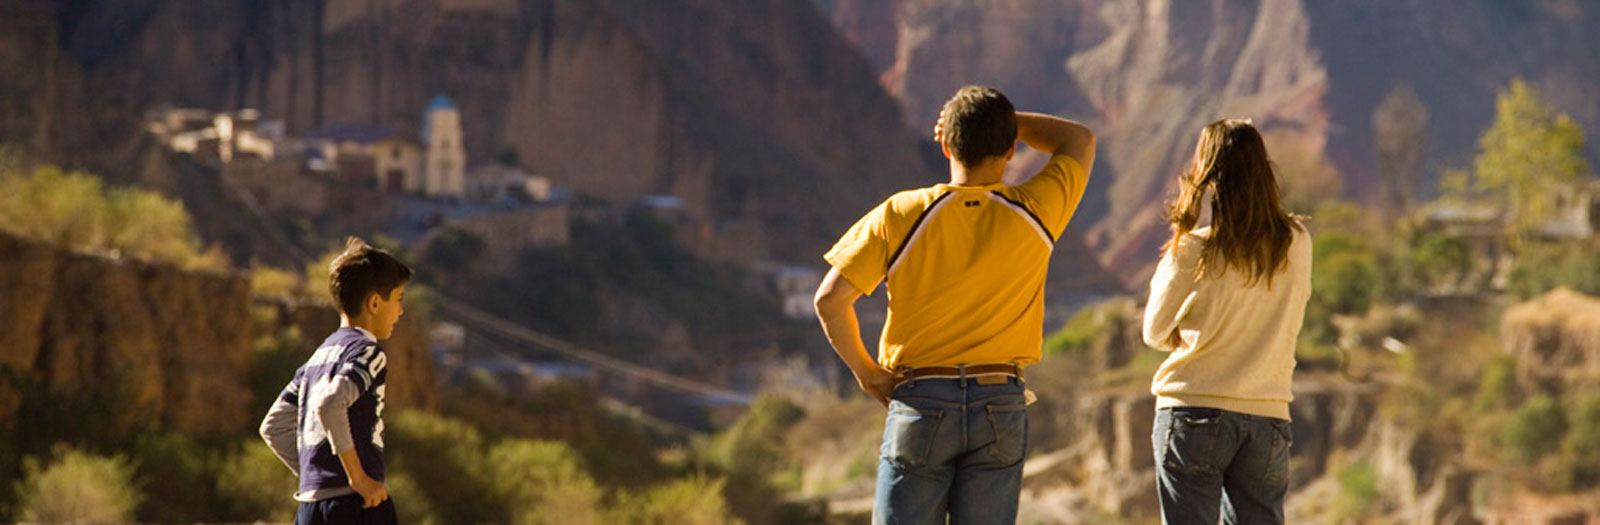 Vista de Iruya, Salta. Por Eliseo Miciu (gentileza de turismo.salta.gov.ar)